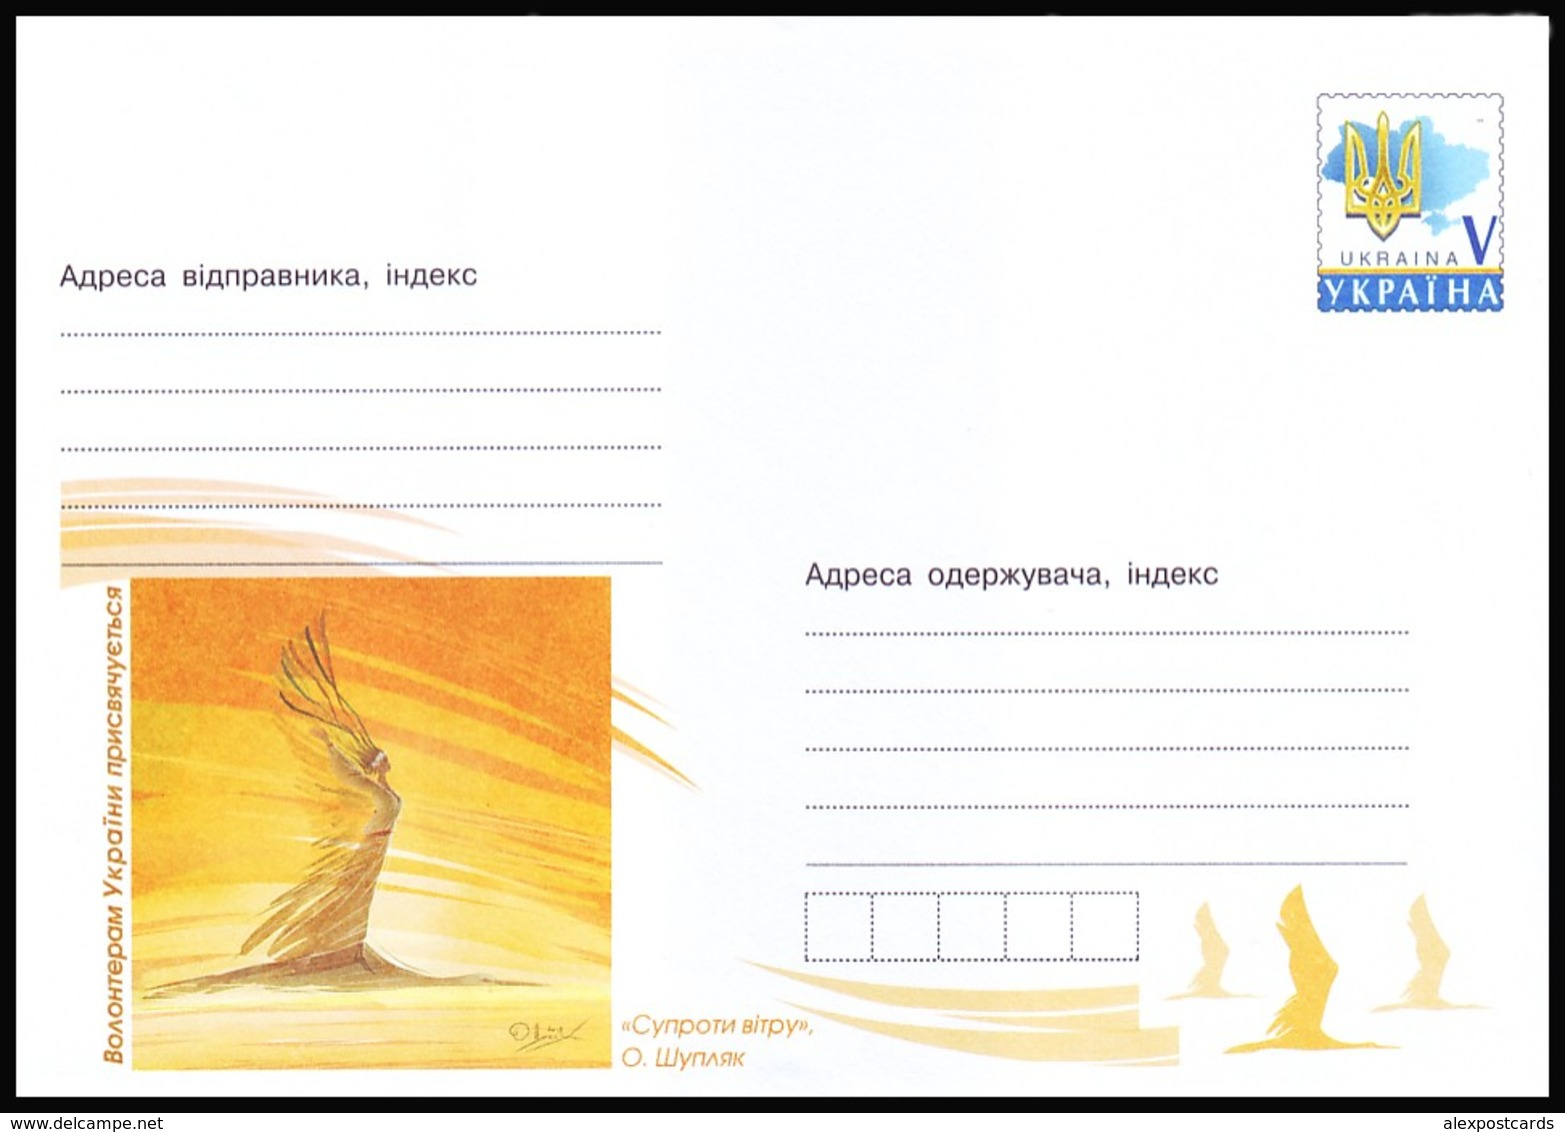 UKRAINE 2018. (18-3729) ''AGAINST THE WIND'', PAINTING By OLEG SHUPLIAK. Postal Stationery Stamped Cover (**) - Ucraina